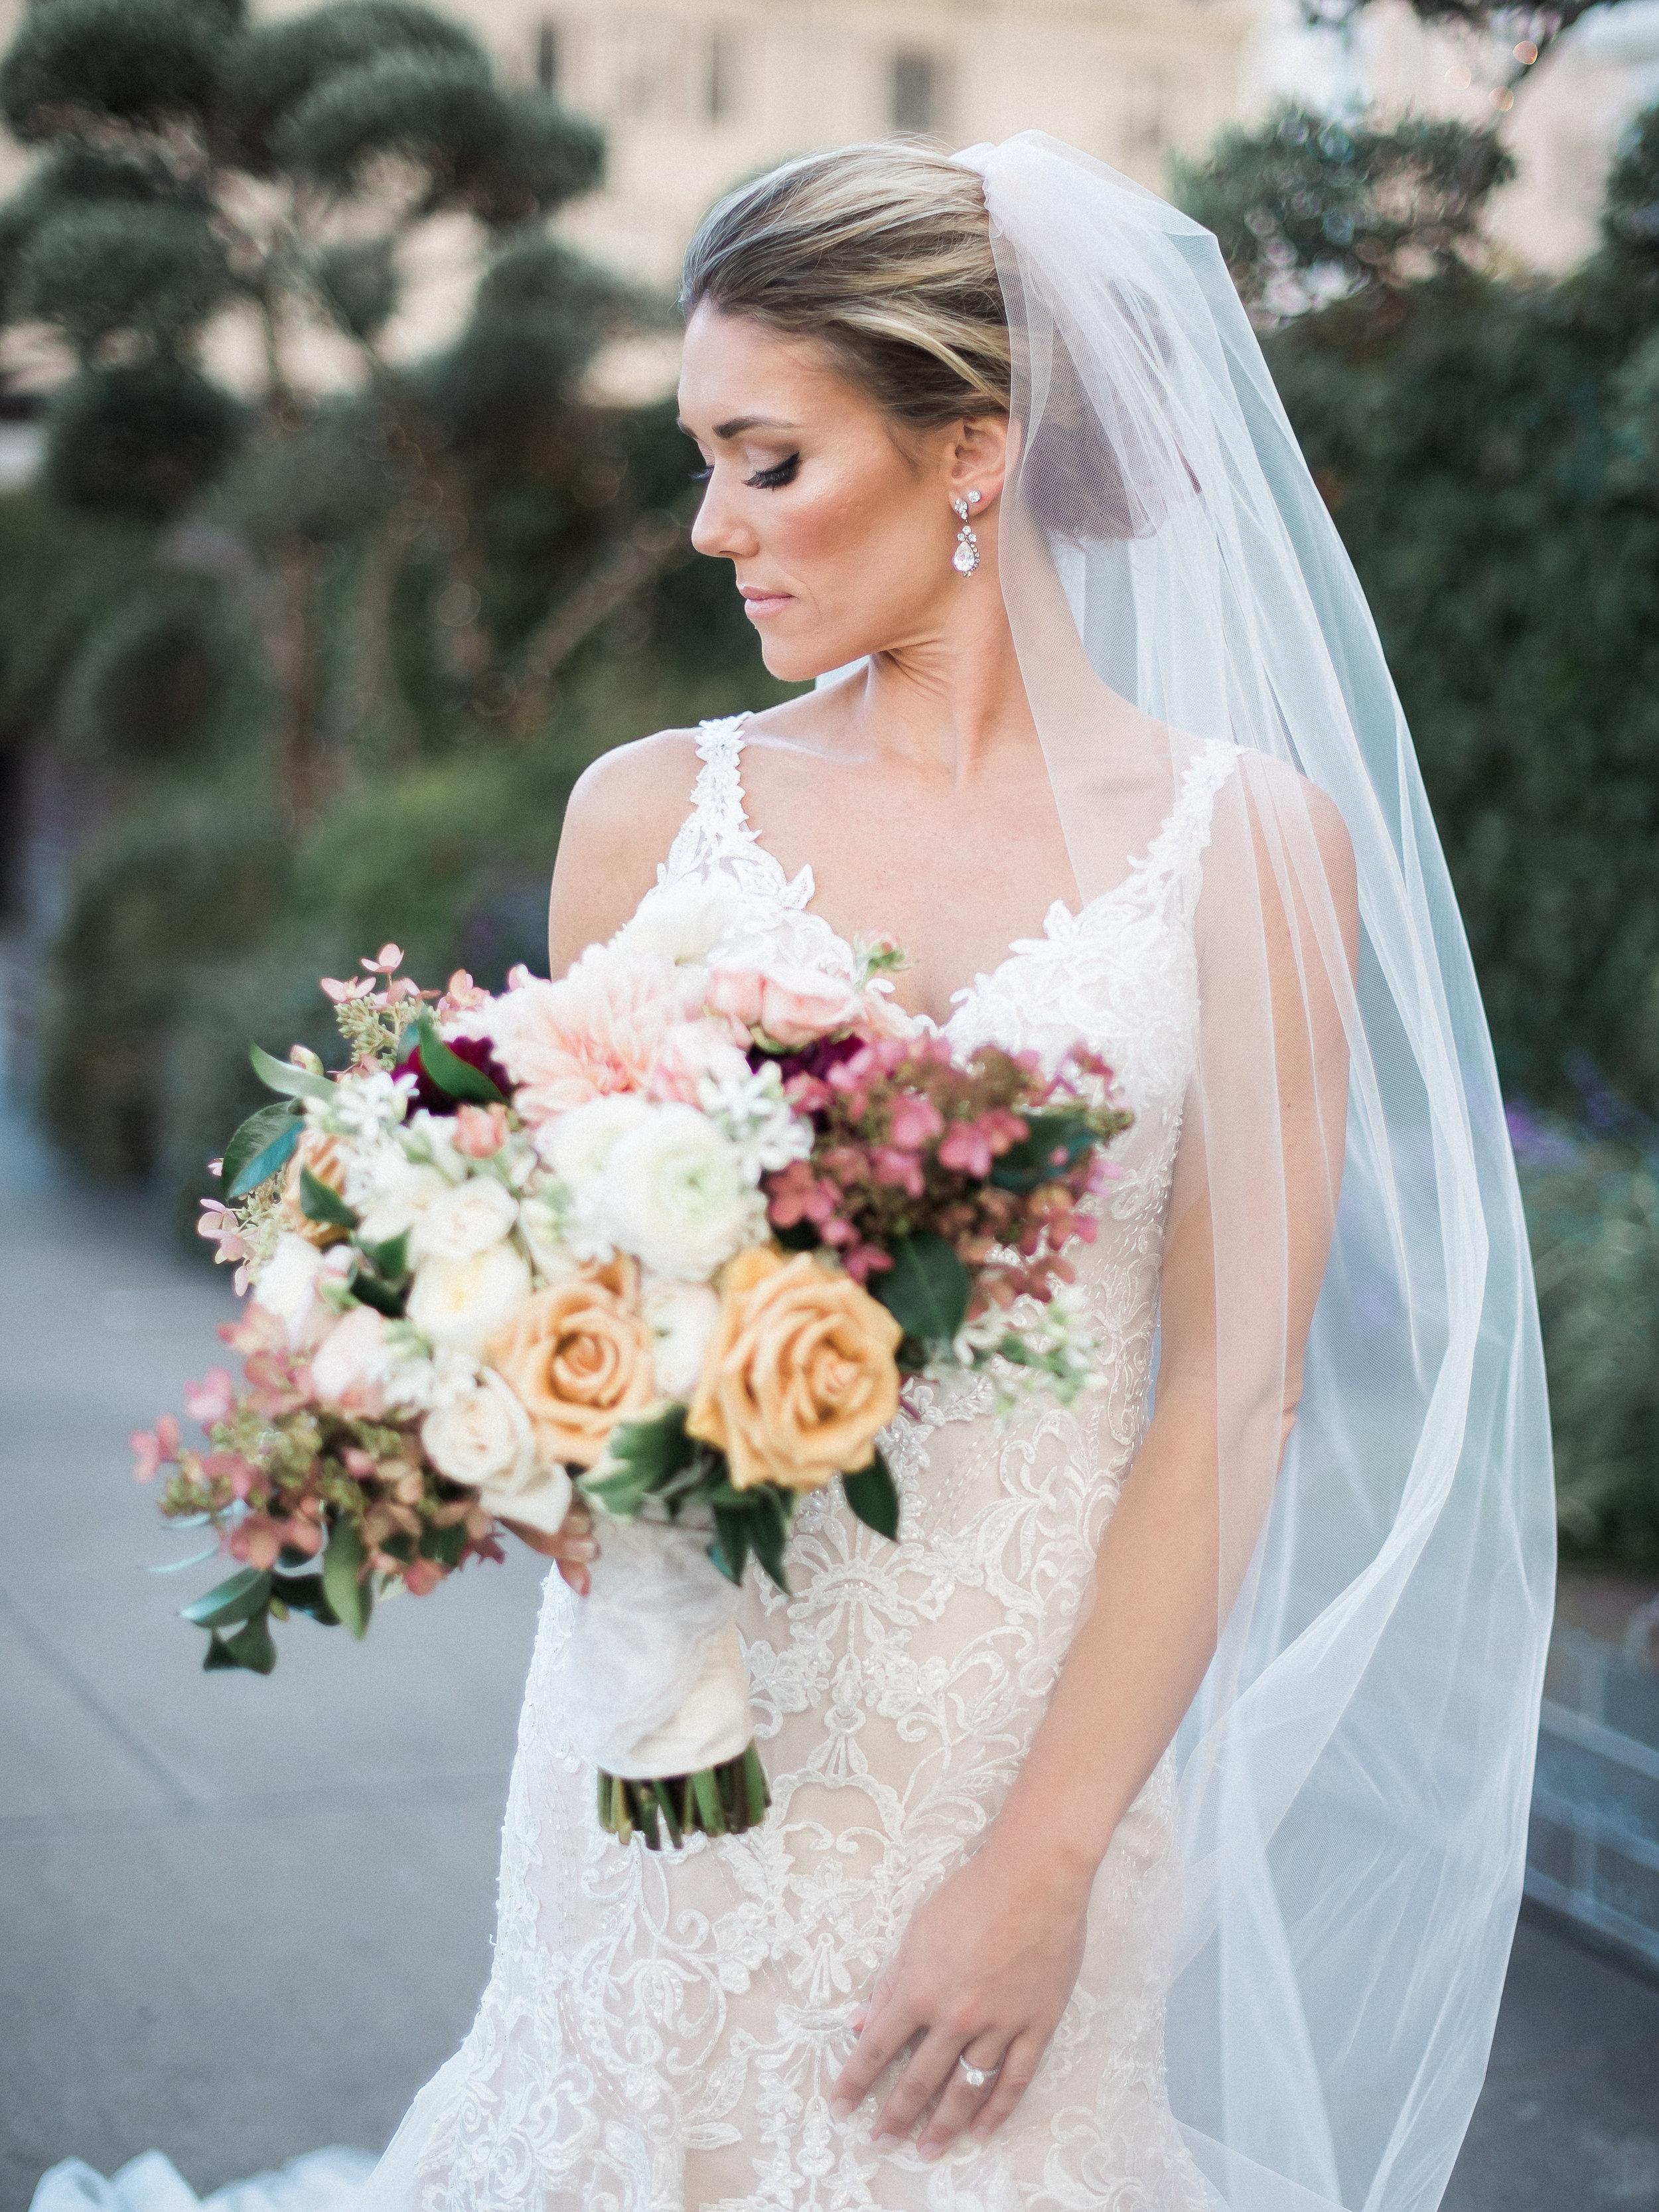 Katie+Nick_wedding_spp-blog-62.jpg